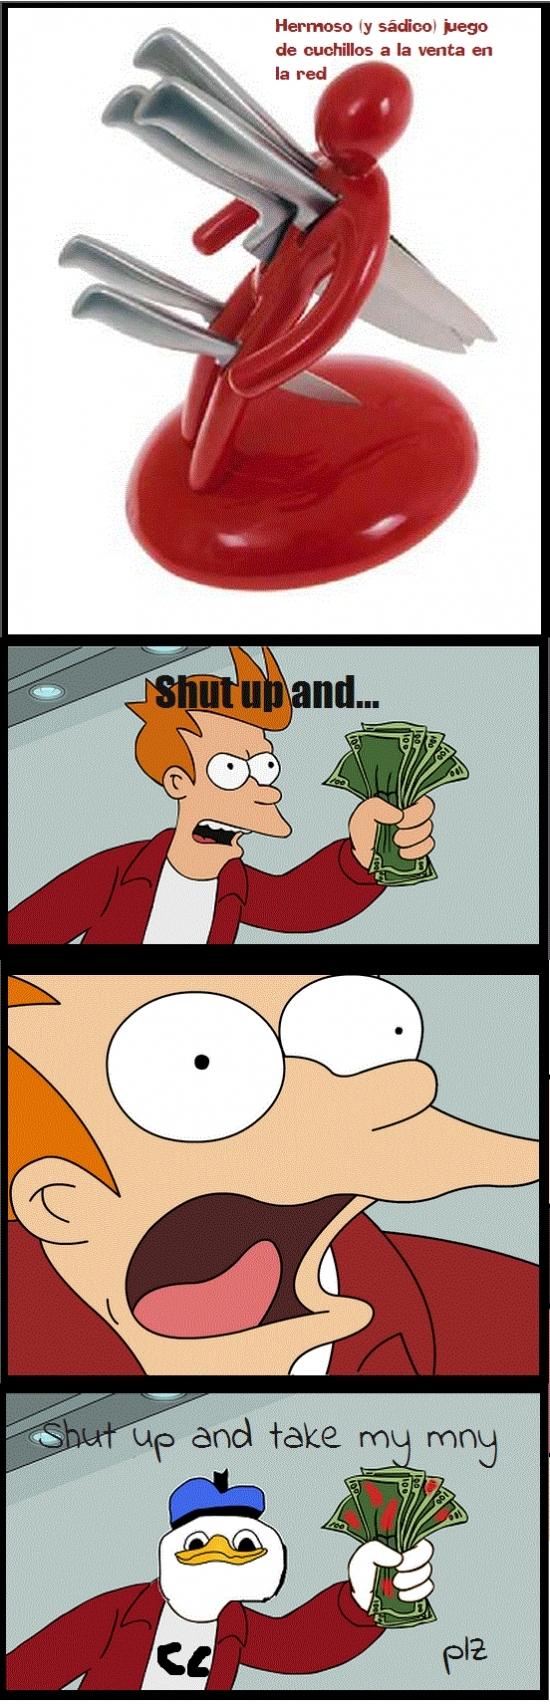 cuchillos,dolan,Fry,juego,shut up and take my money